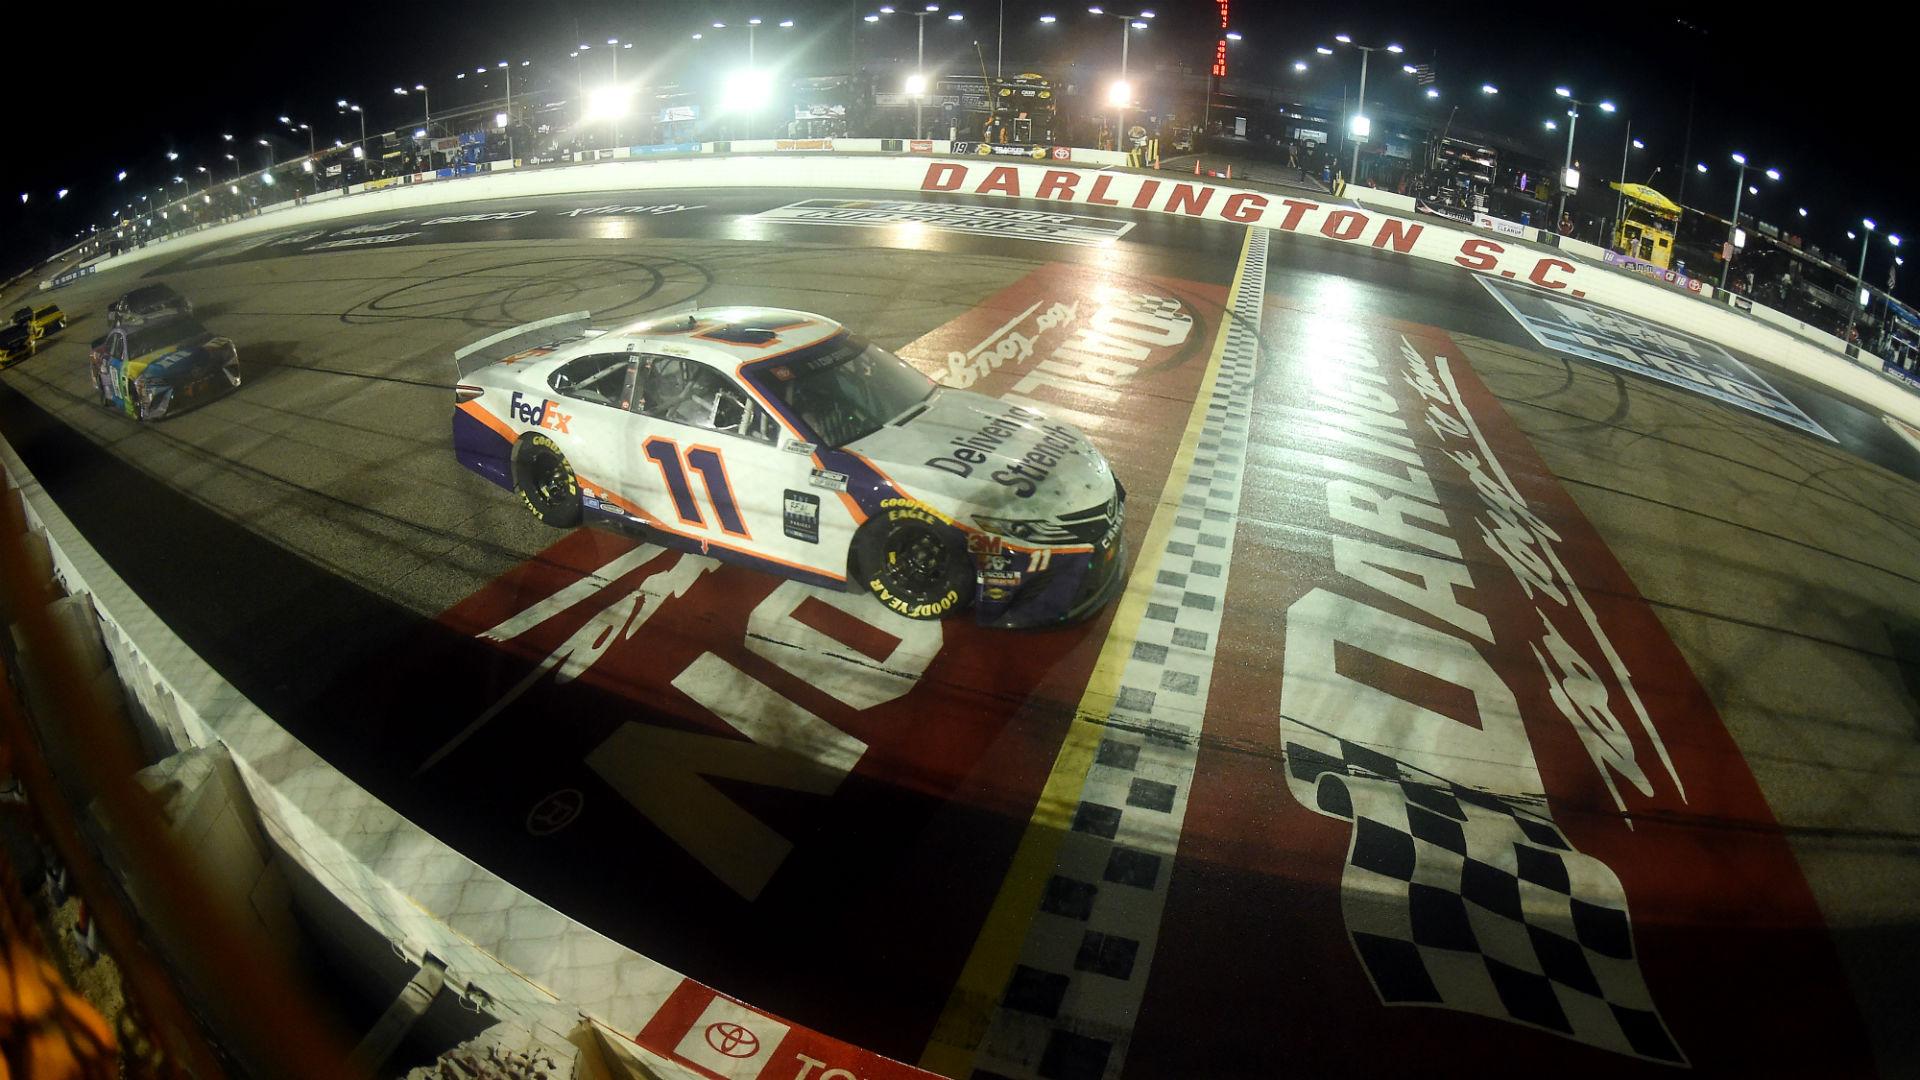 NASCAR at Darlington race results, highlights from Denny Hamlin's rain-shortened victory at the Toyota 500